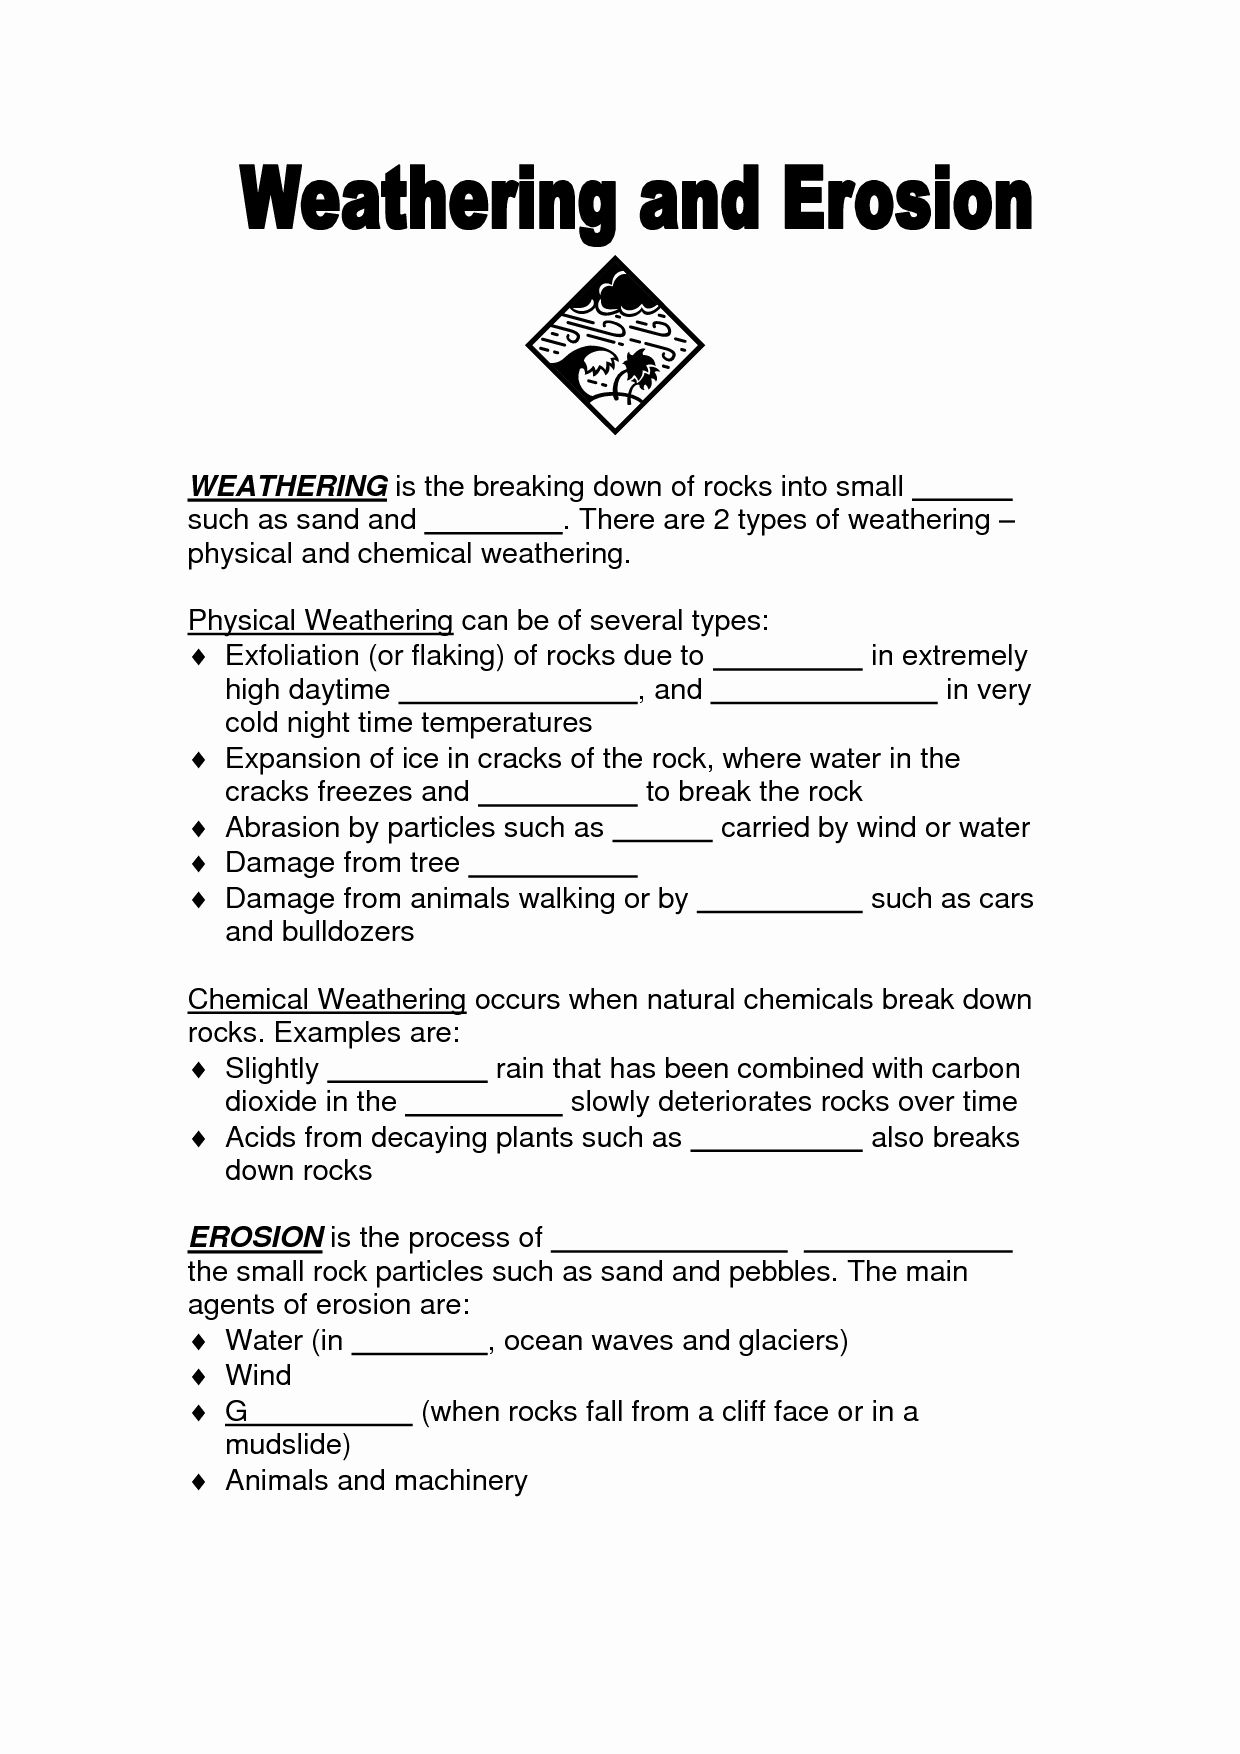 Weathering Erosion And Deposition Worksheet Fresh 16 Best